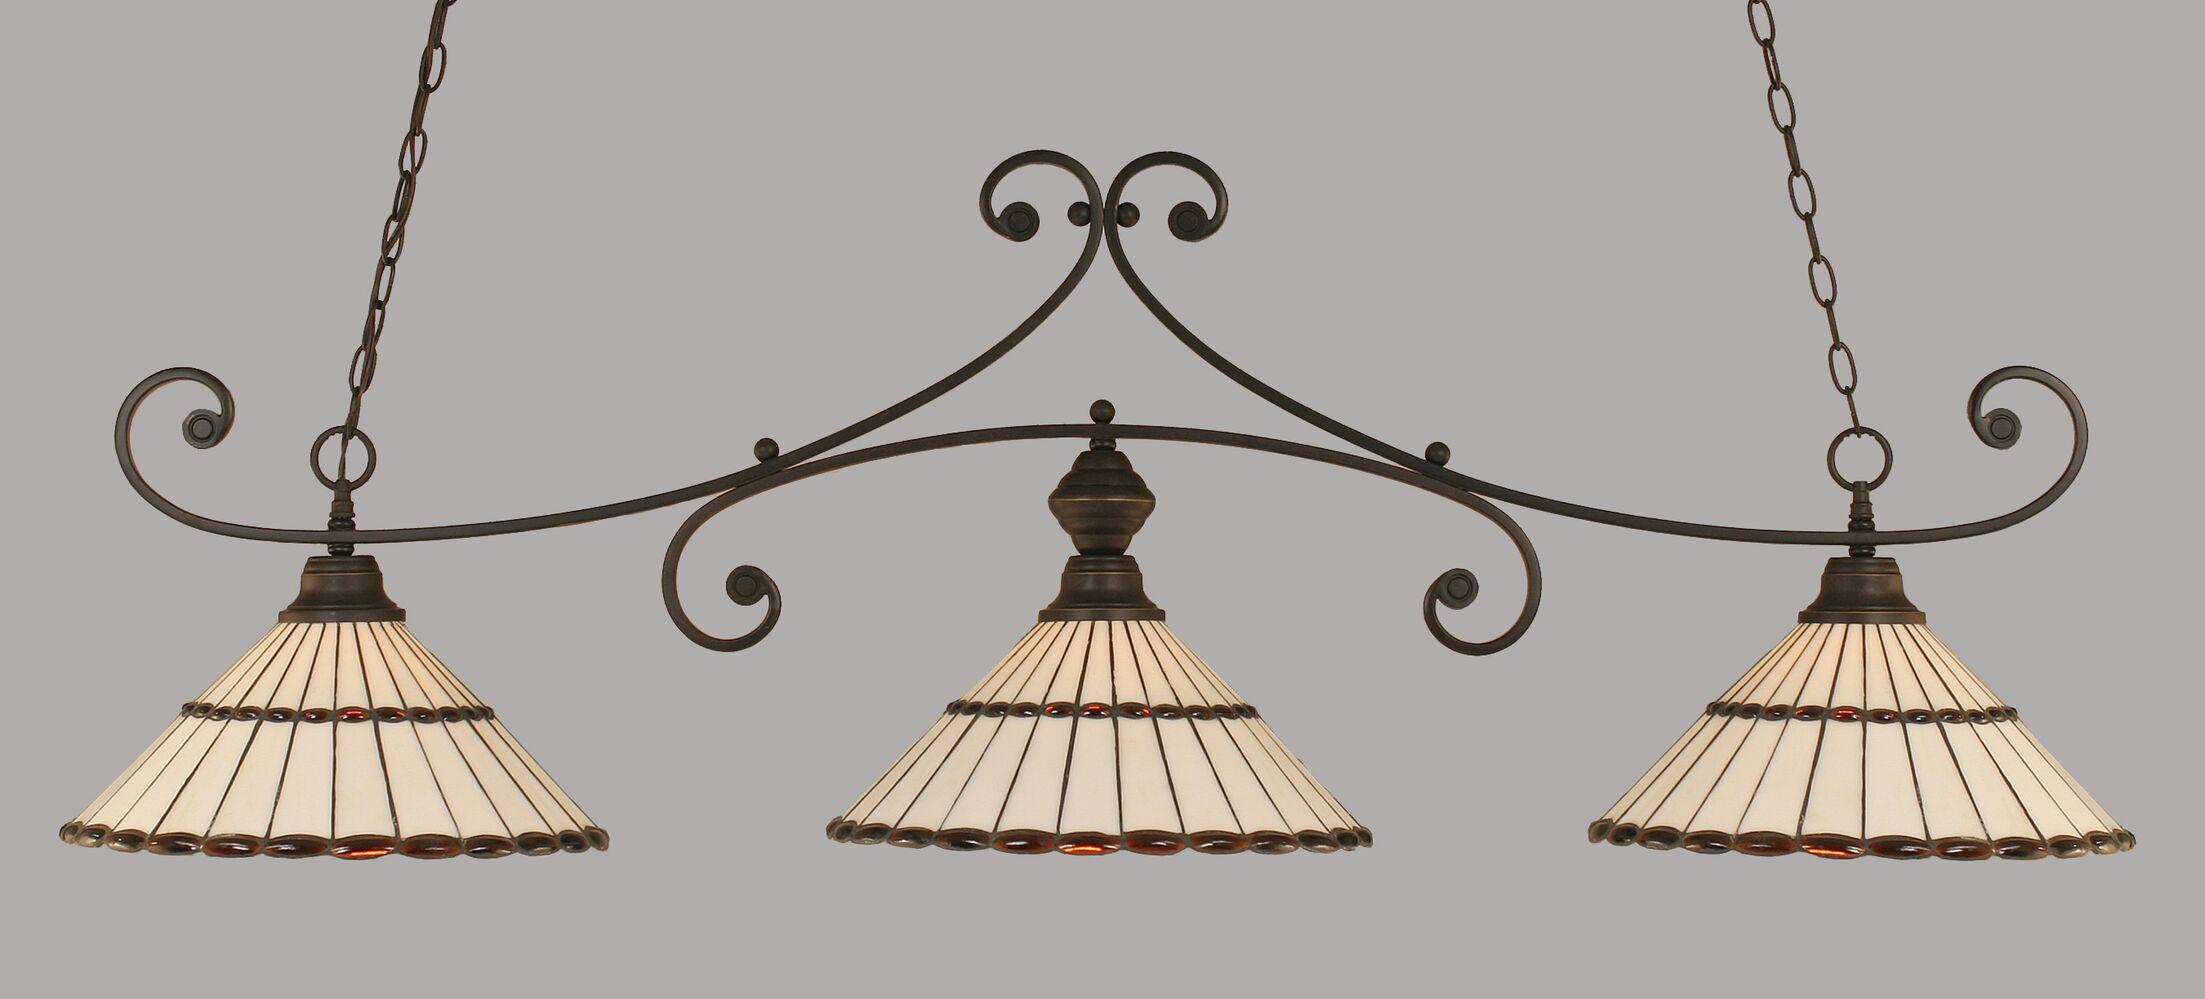 Copeland 3-Light Billiard Light Shade Color: Honey and Amber Brown, Color: Dark Granite